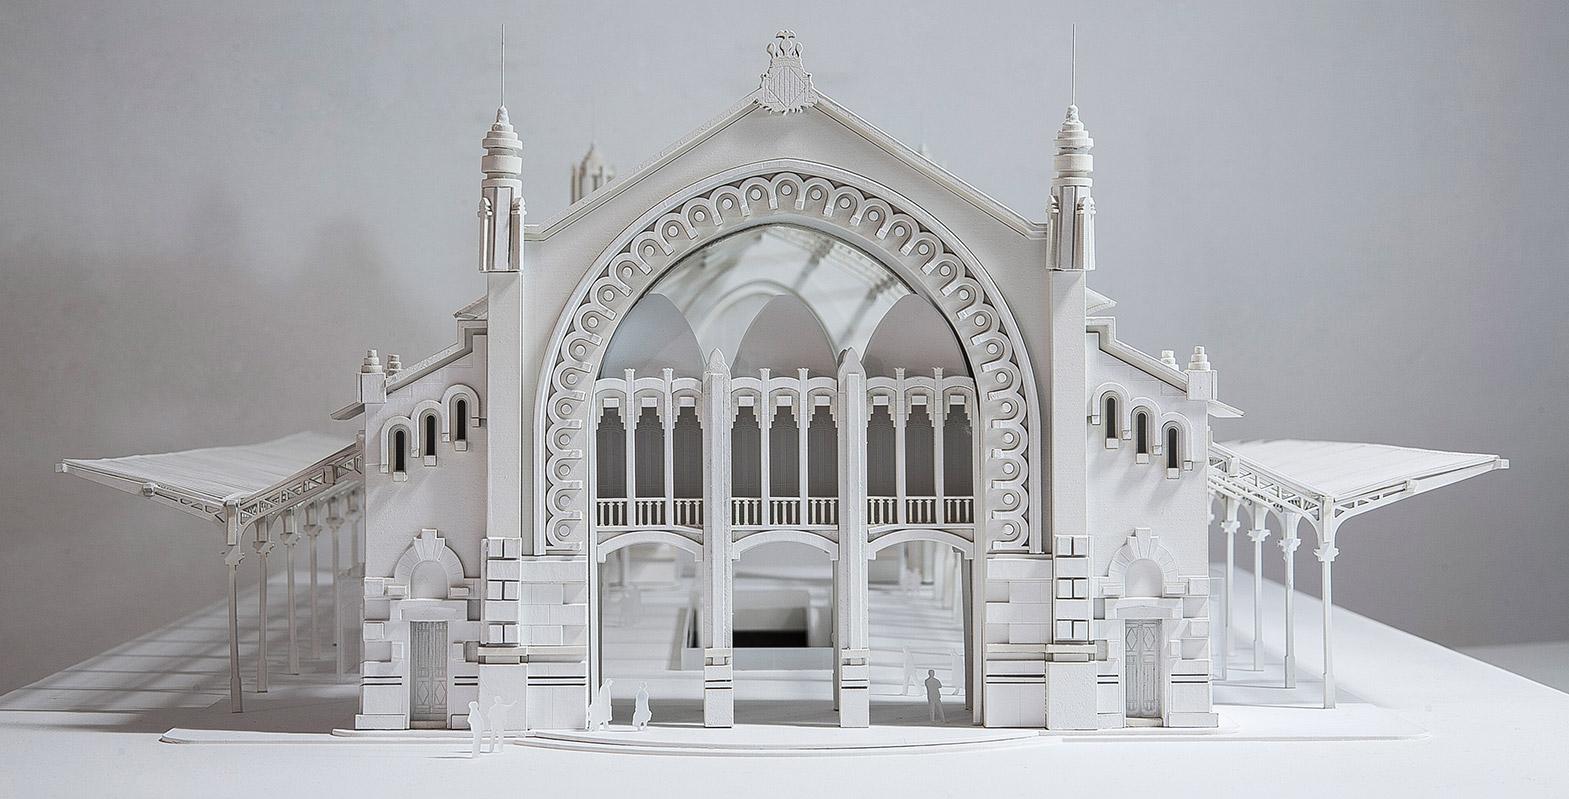 maqueta-arquitectura-mercado-colon-valencia-arquiayuda (7)